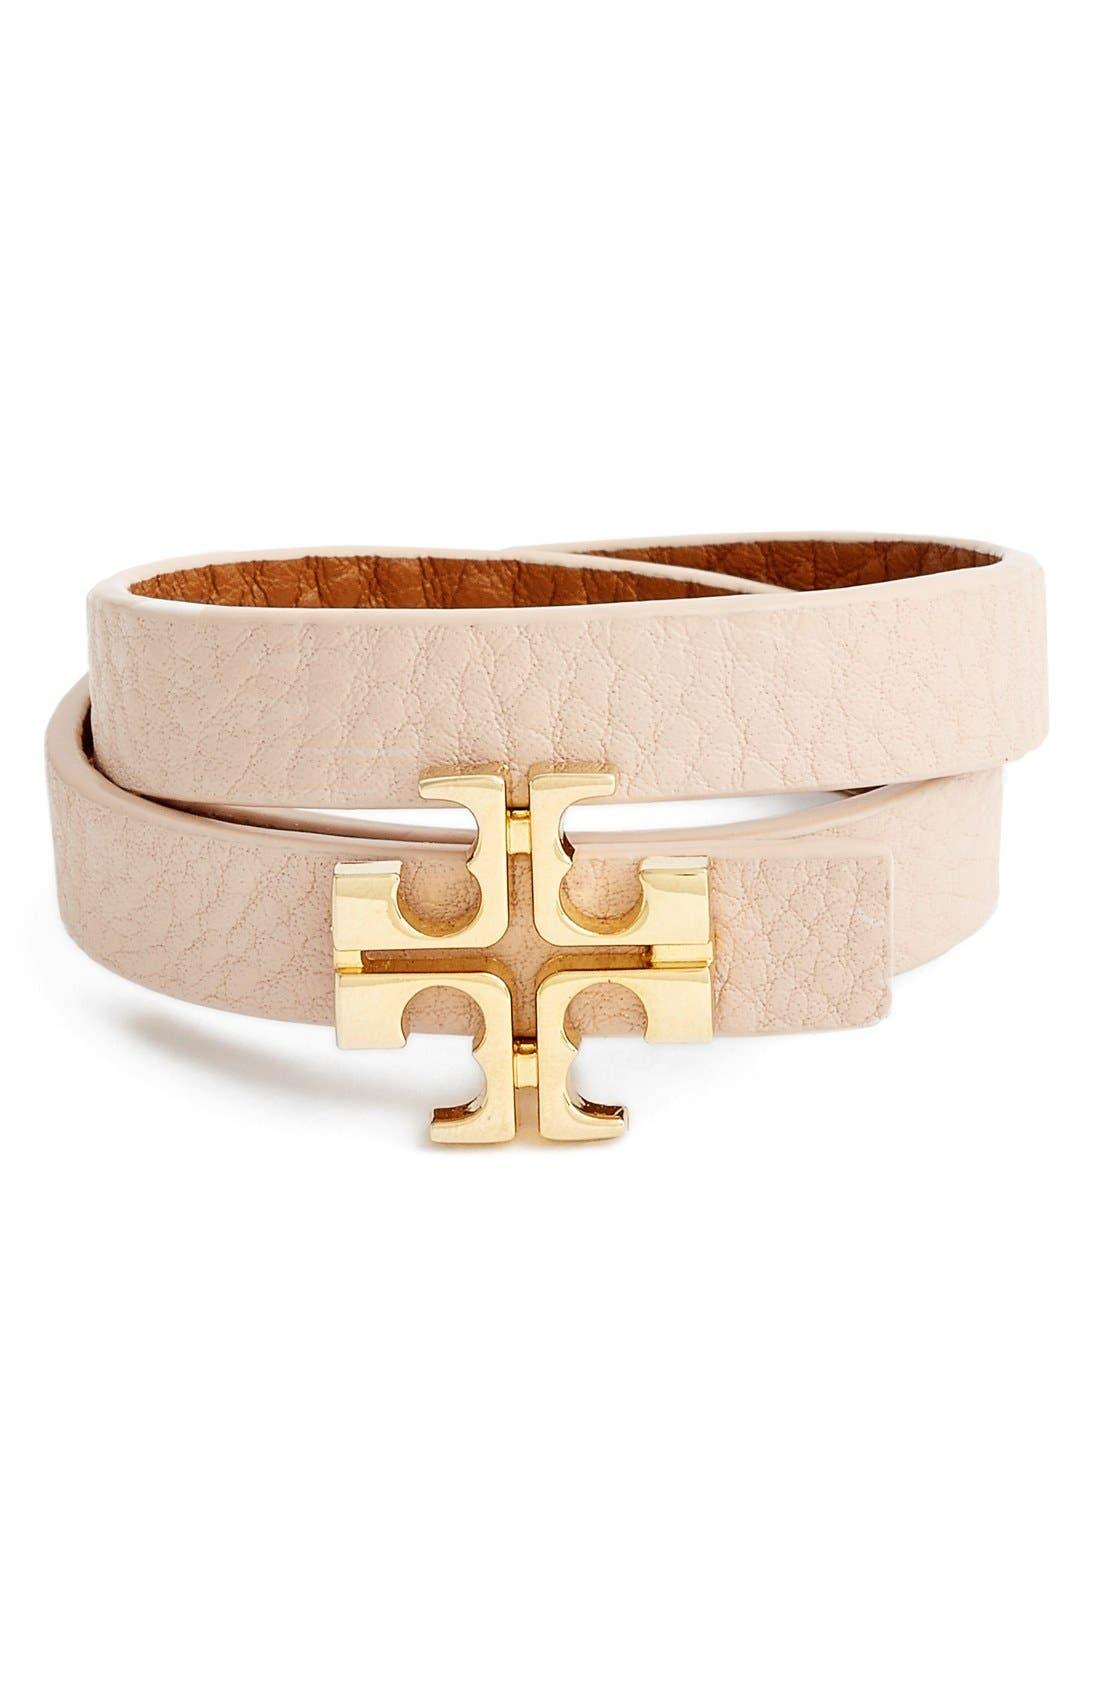 Main Image - Tory Burch 'Split T' Reversible Leather Wrap Bracelet